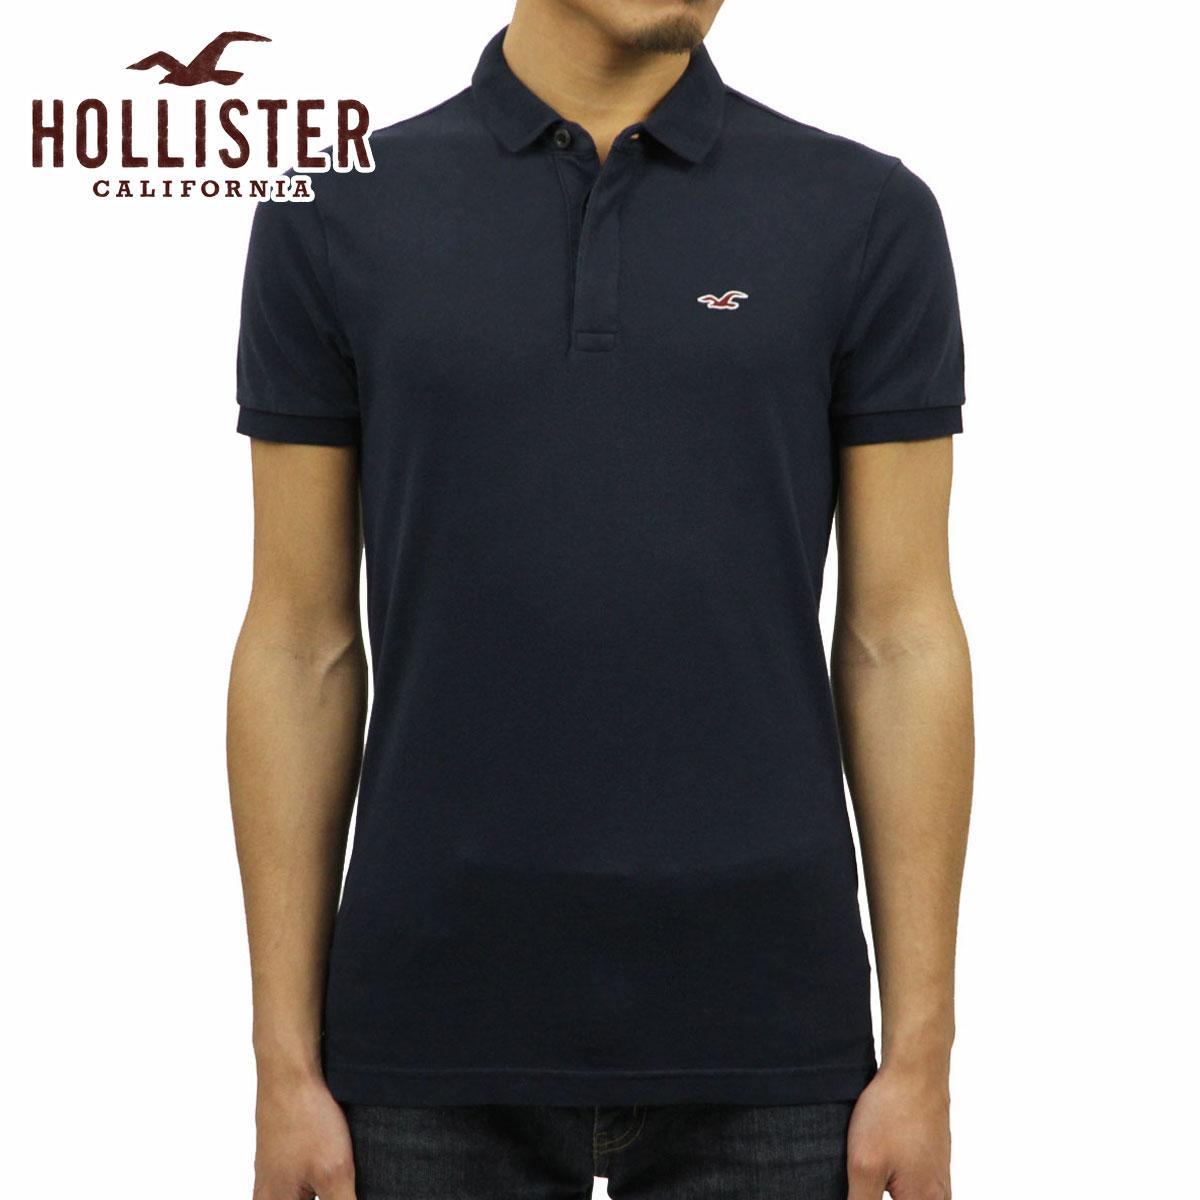 40dace12 Hori star HOLLISTER regular article men slim FITONE point logo short  sleeves polo shirt Stretch Shrunken ...